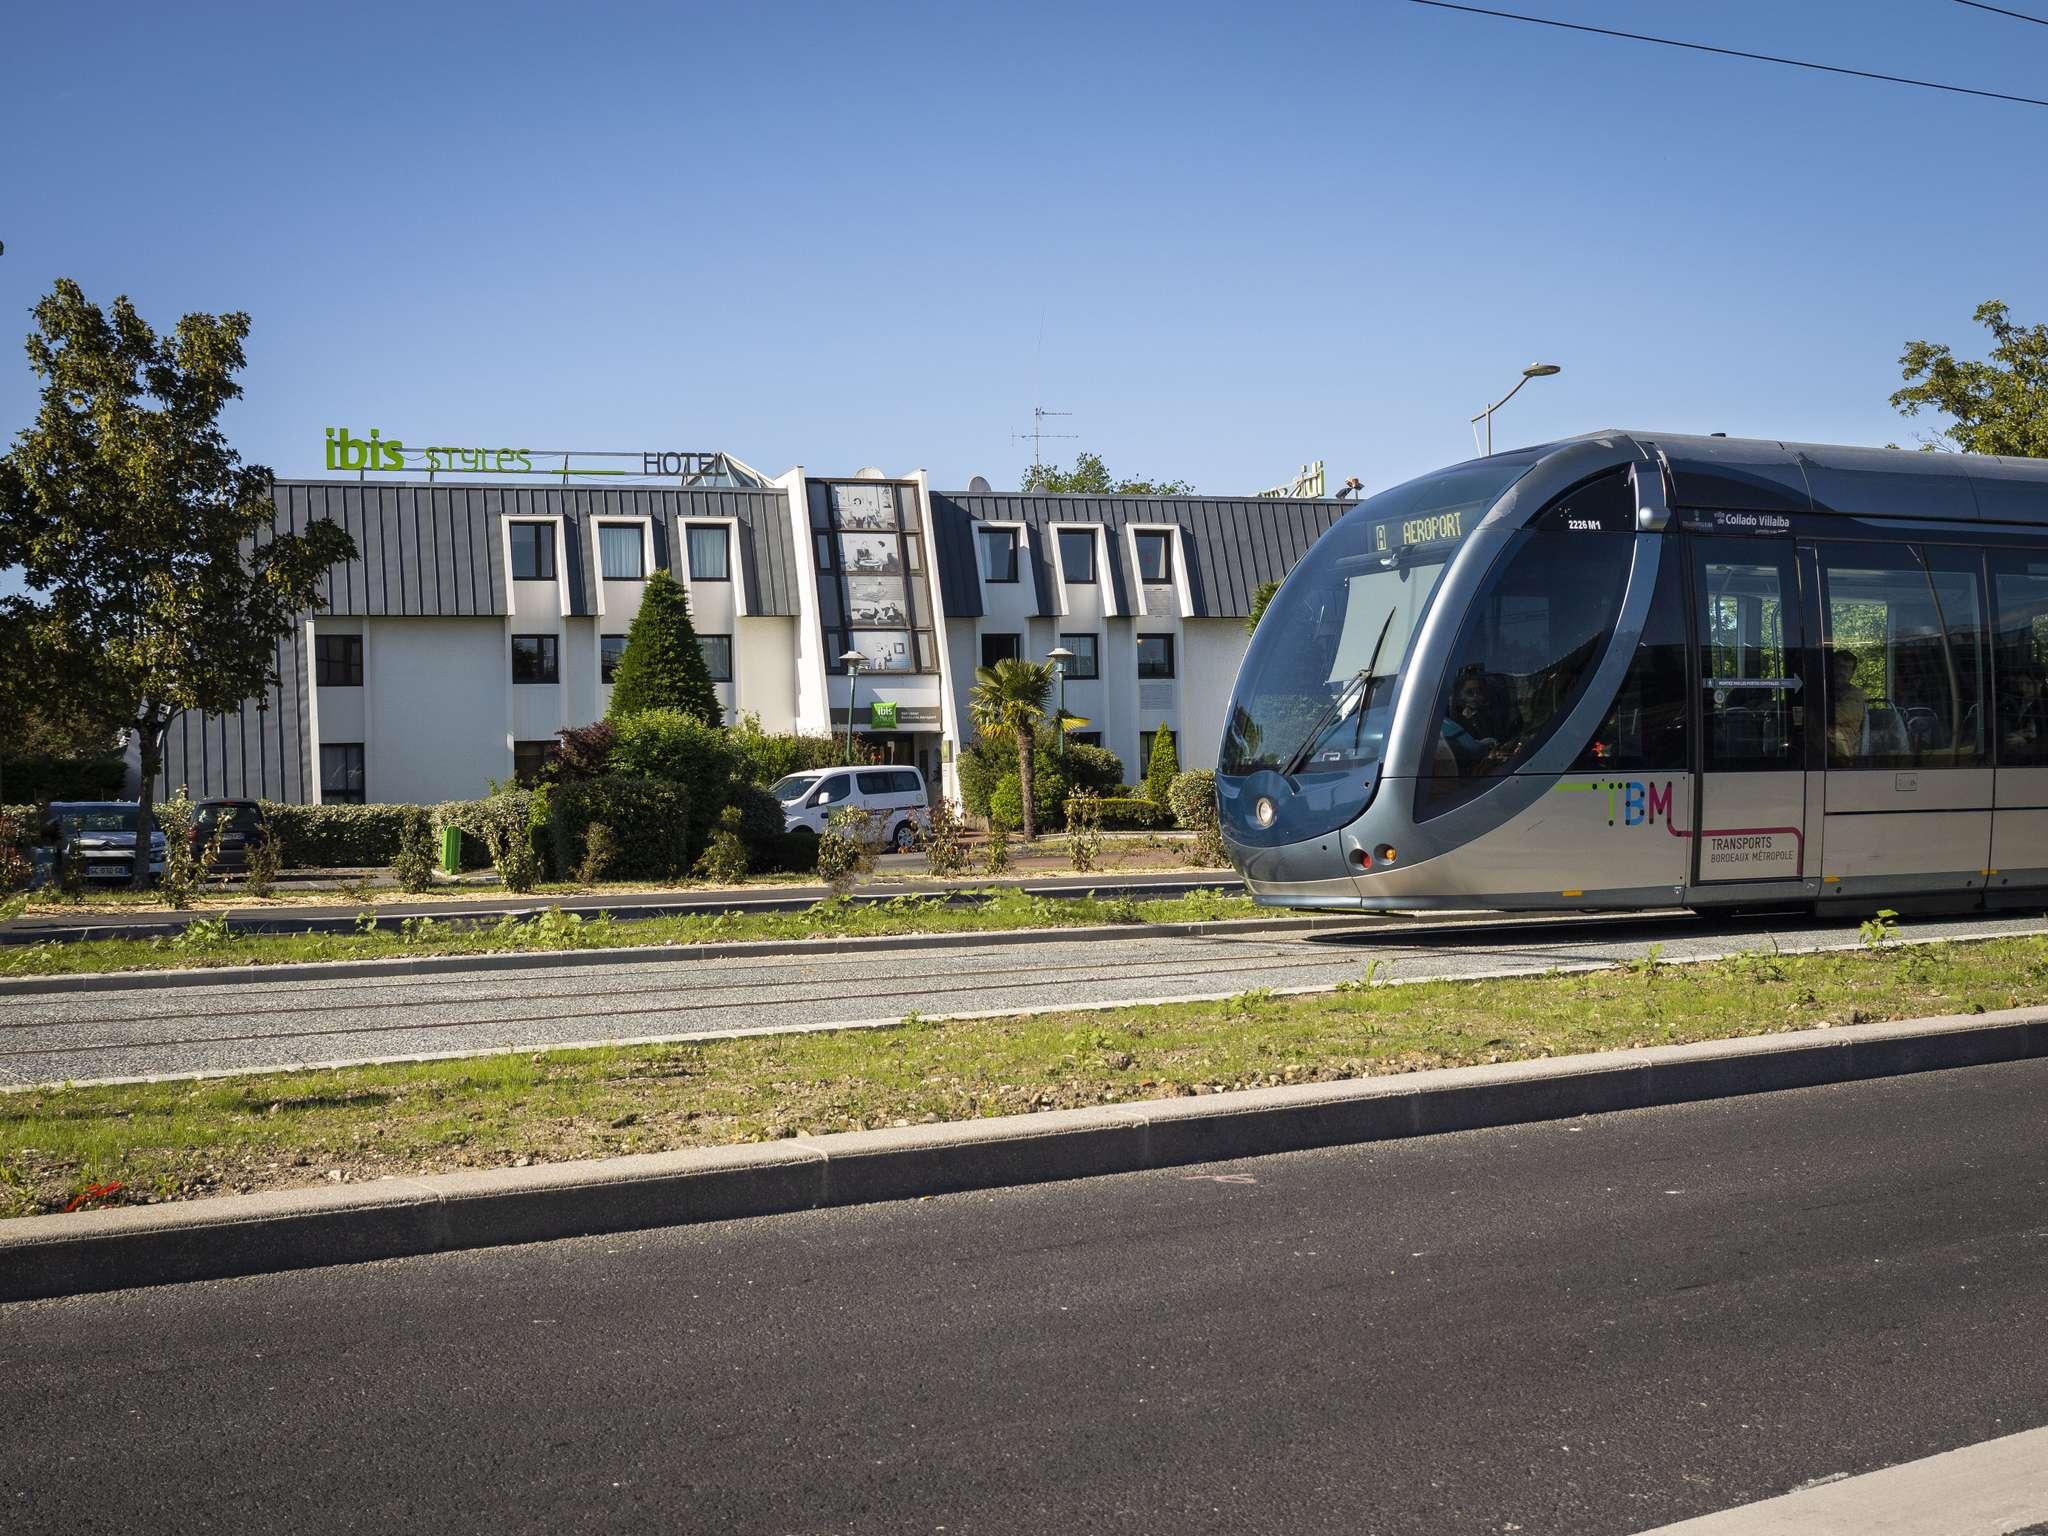 Hotel – ibis Styles Bordeaux Aeroport